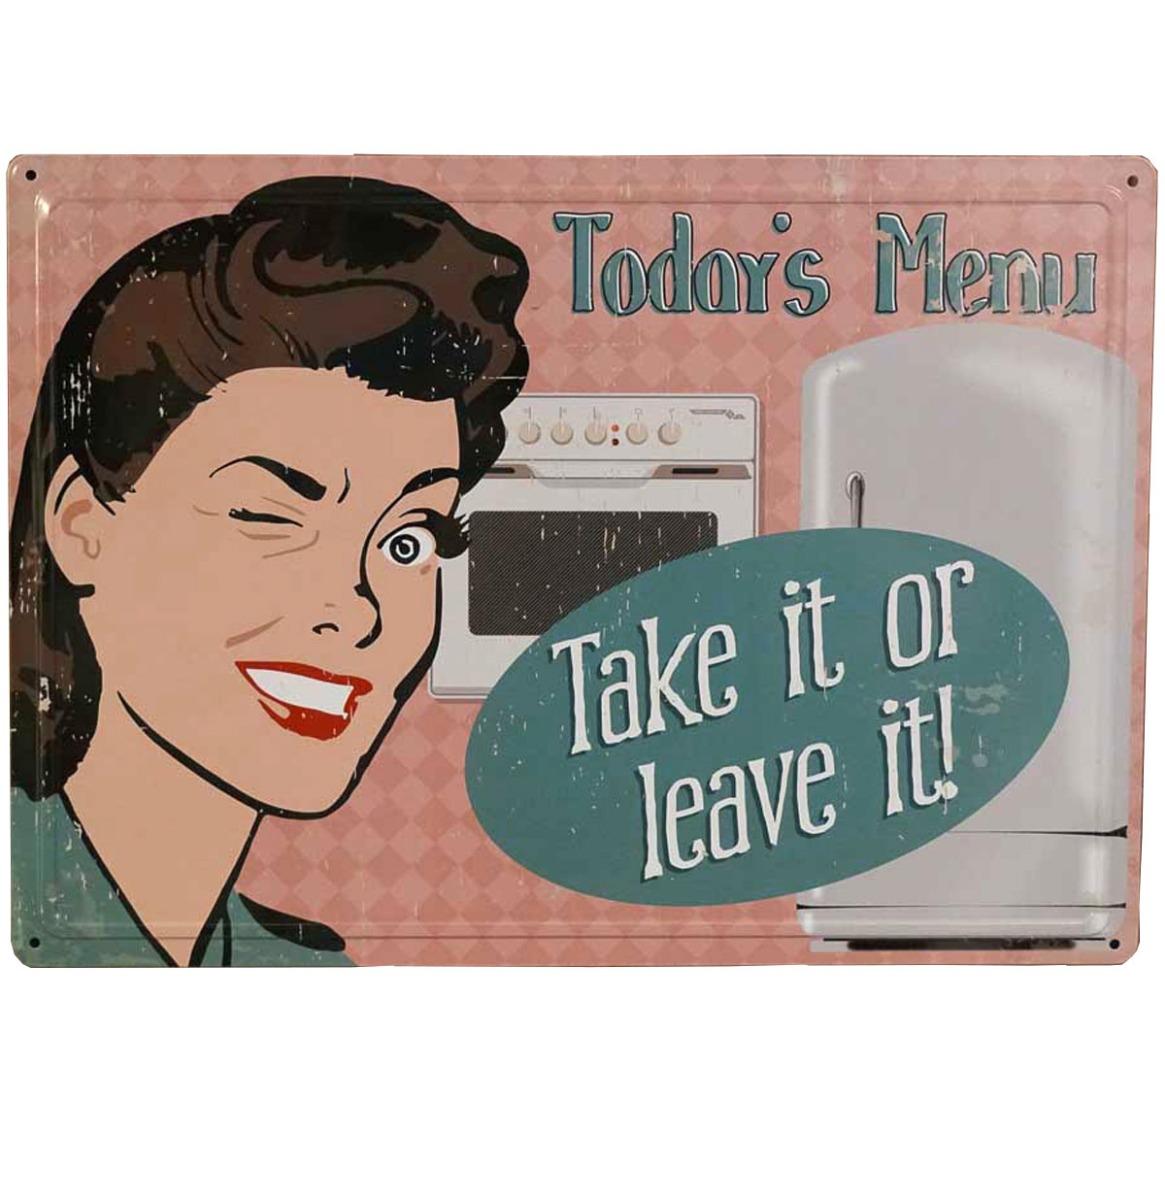 Today's Menu Take It Or Leave It Metalen Bord Met Reliëf - 43 x 31 cm